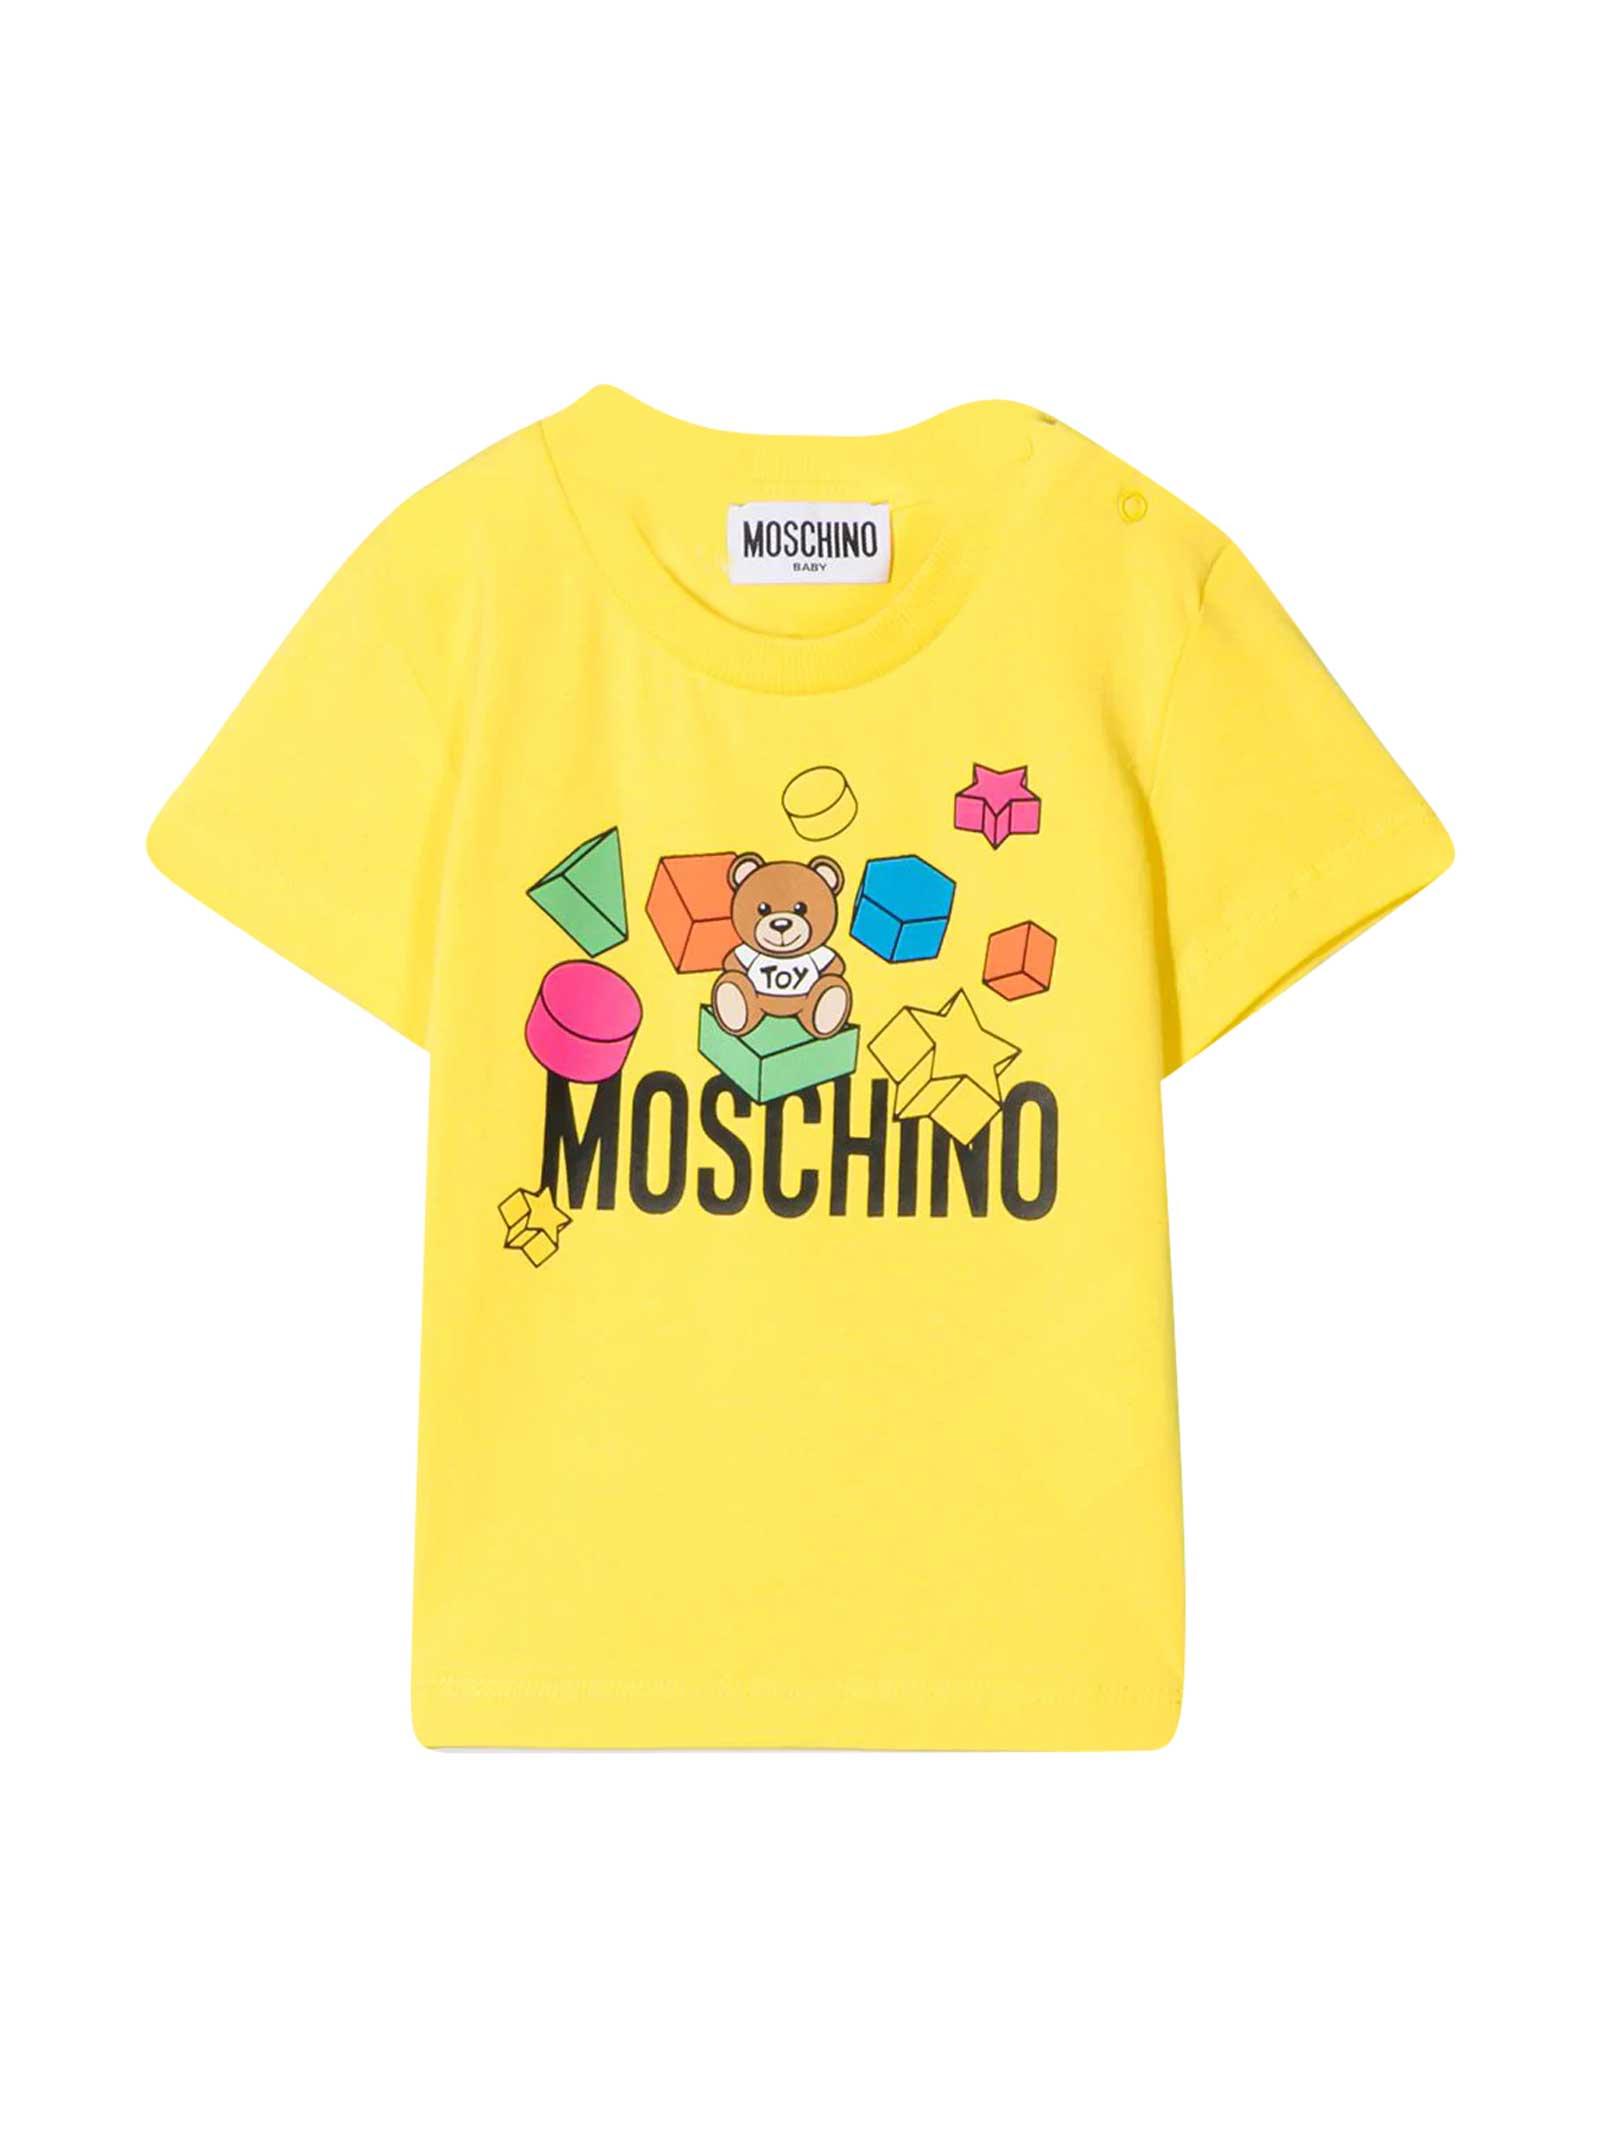 Moschino T-shirts YELLOW T-SHIRT